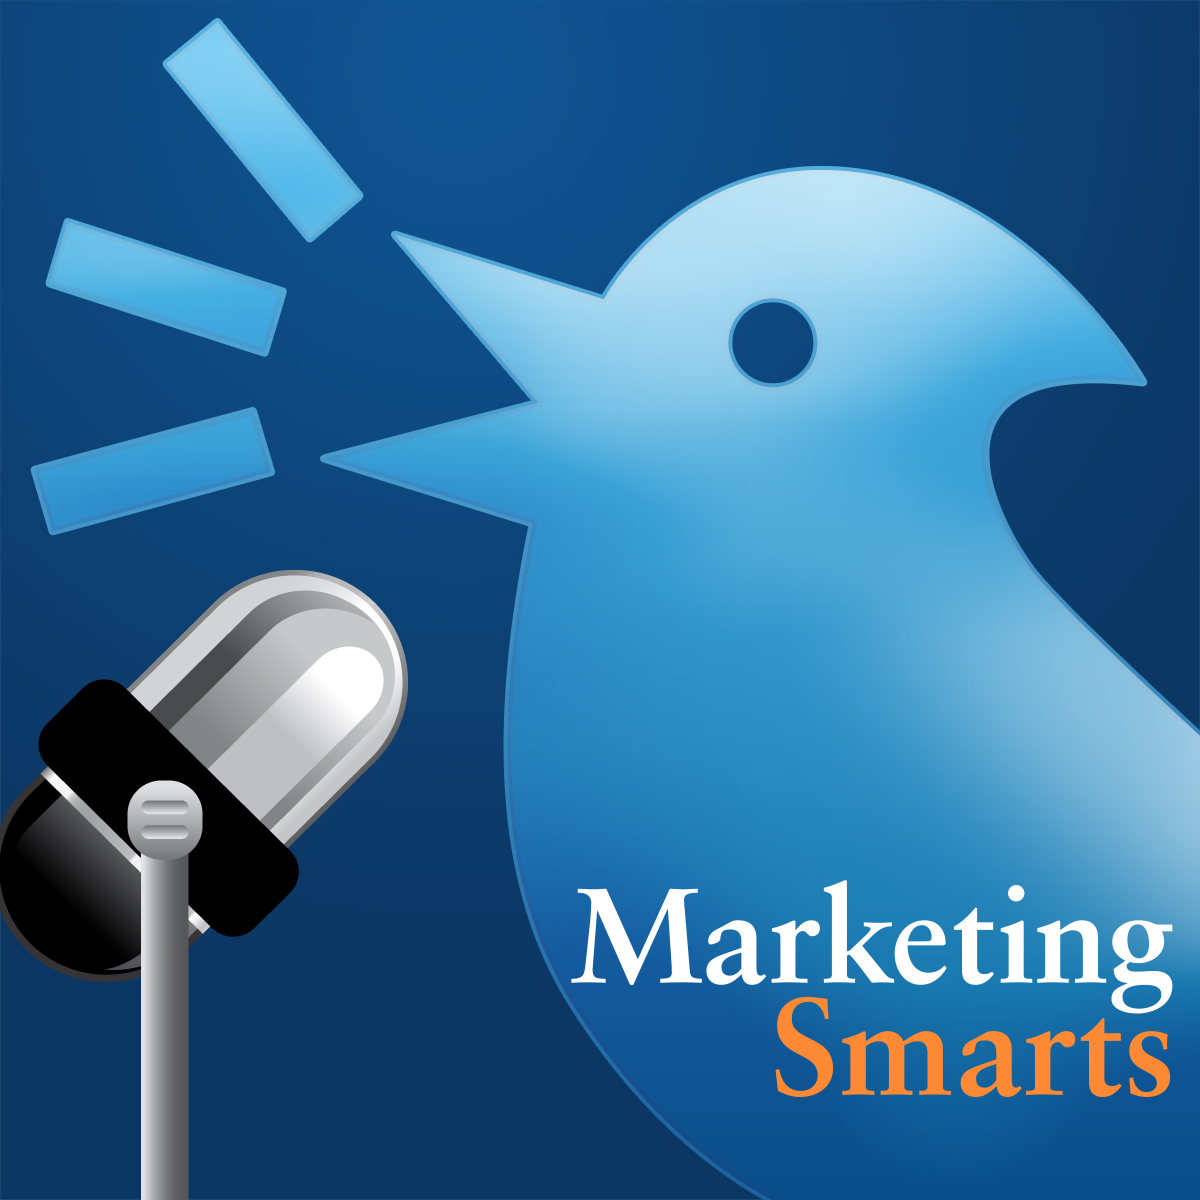 marketing-smarts-marketing-profs-podcast